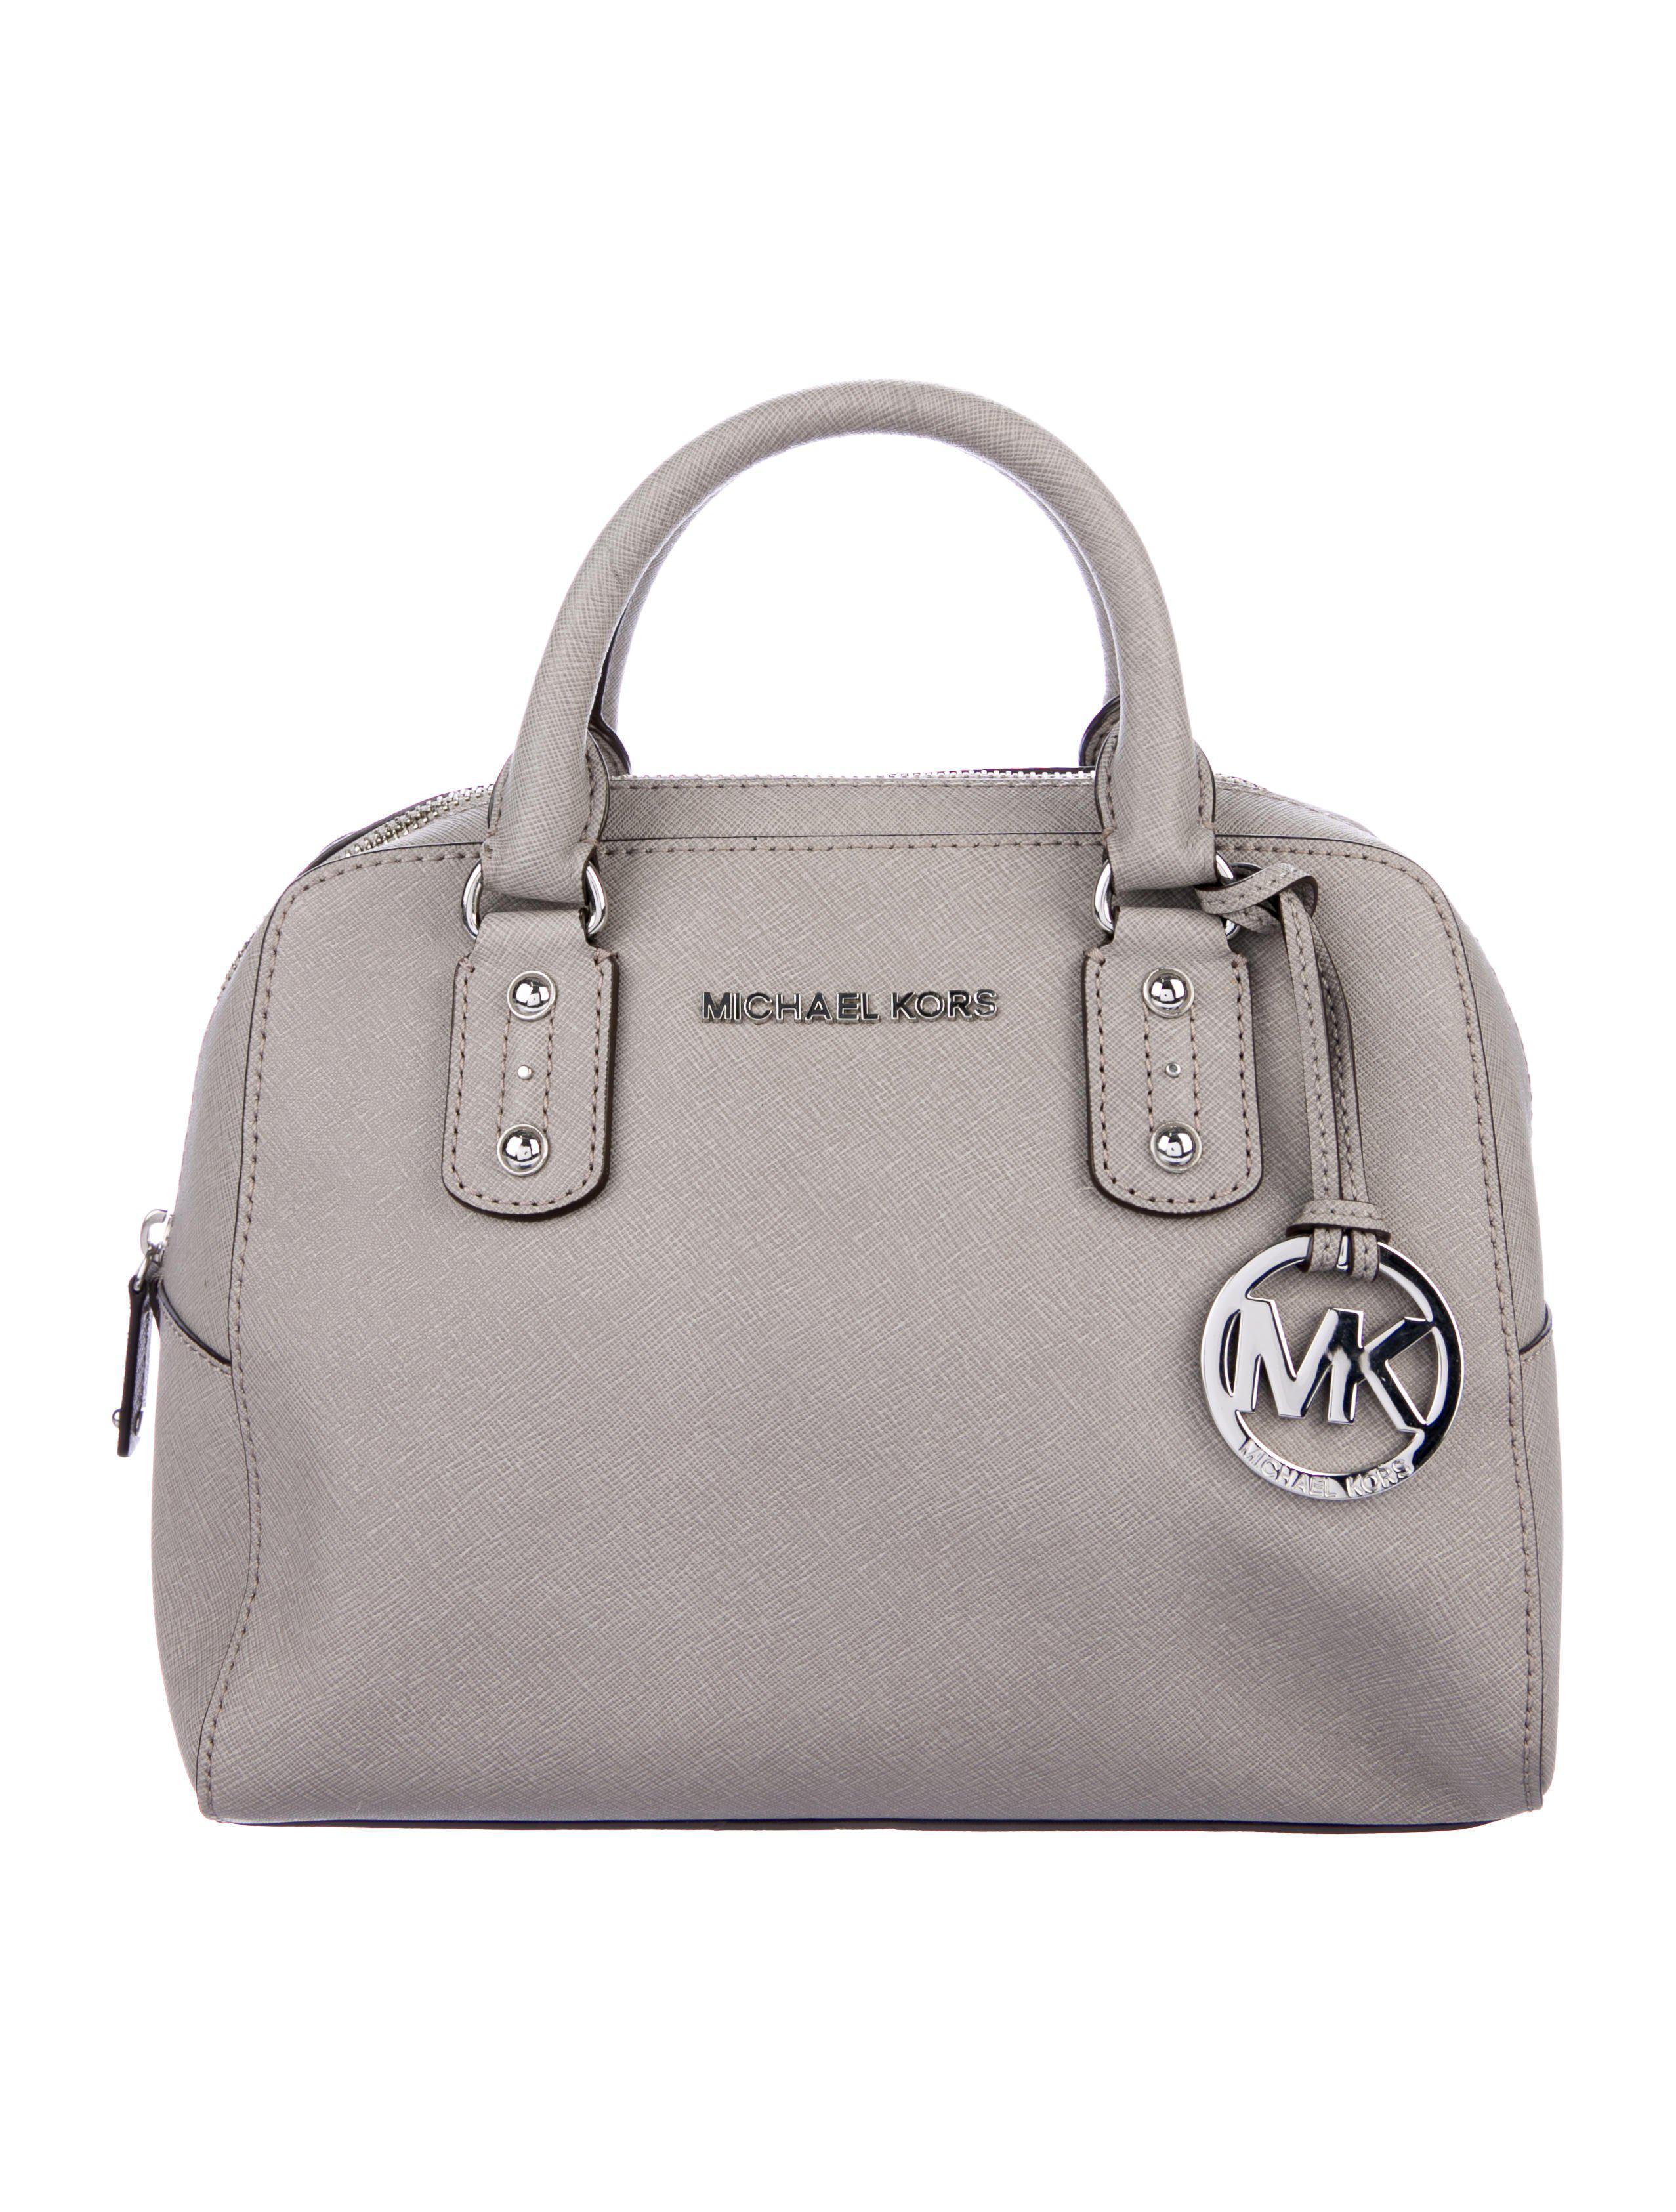 58db99a39044 MICHAEL Michael Kors. Women s Metallic Michael Kors Saffiano Leather ...